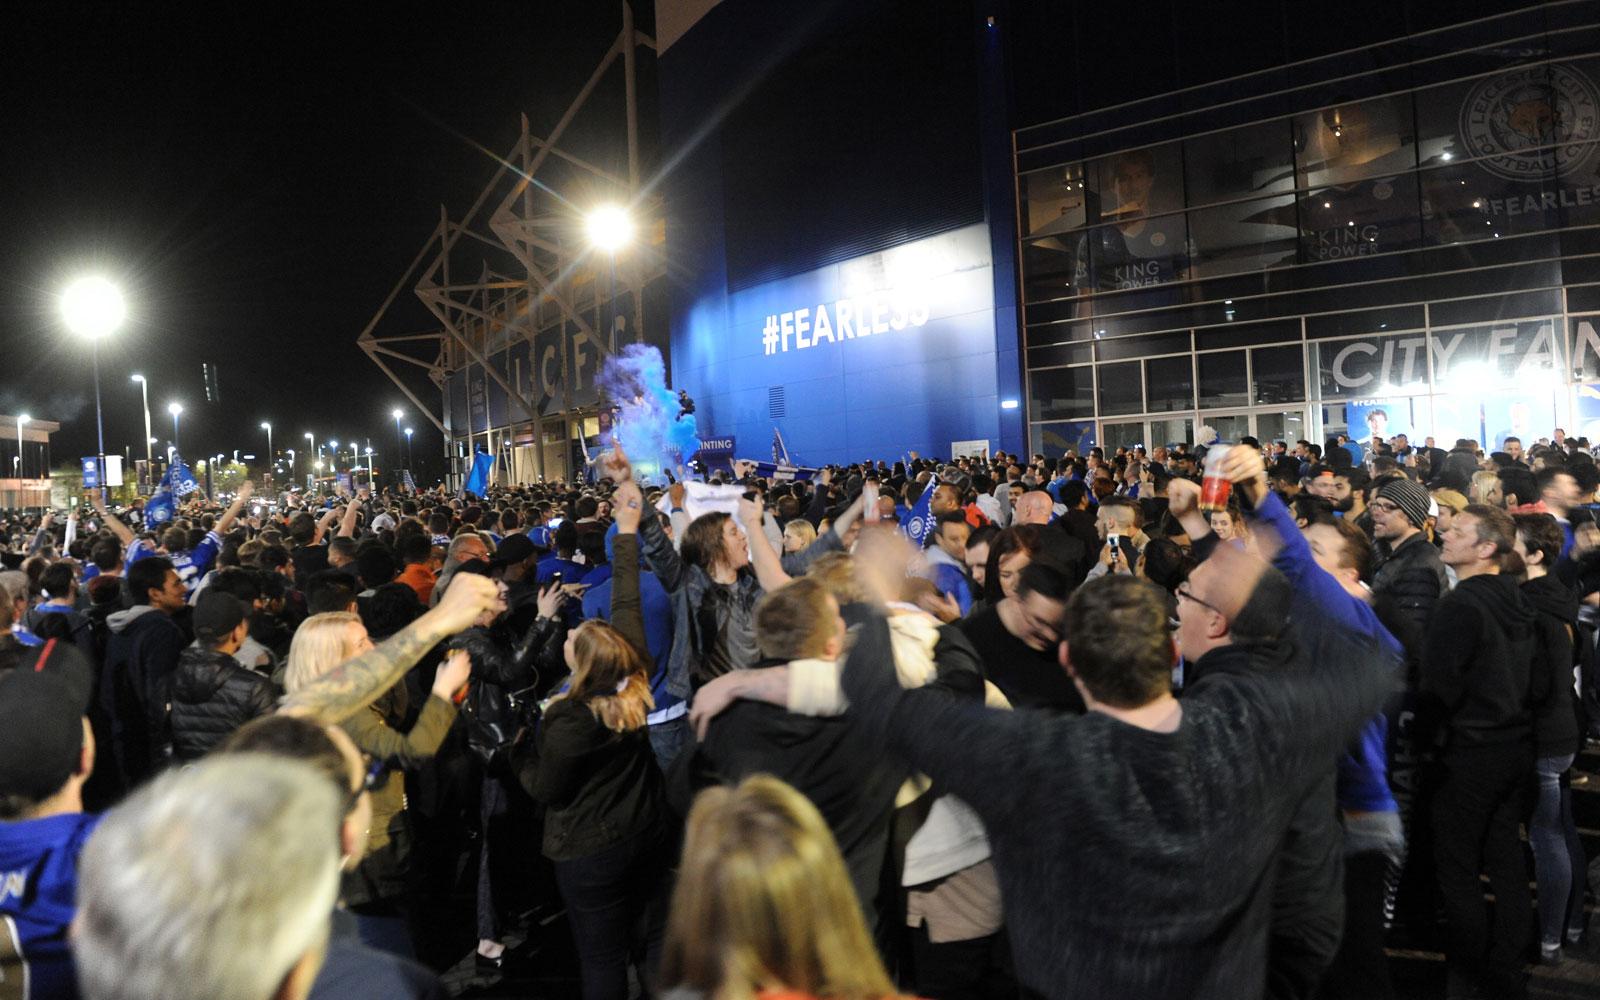 Leicester fans gather en masse around King Power Stadium to celebrate their Premier League title